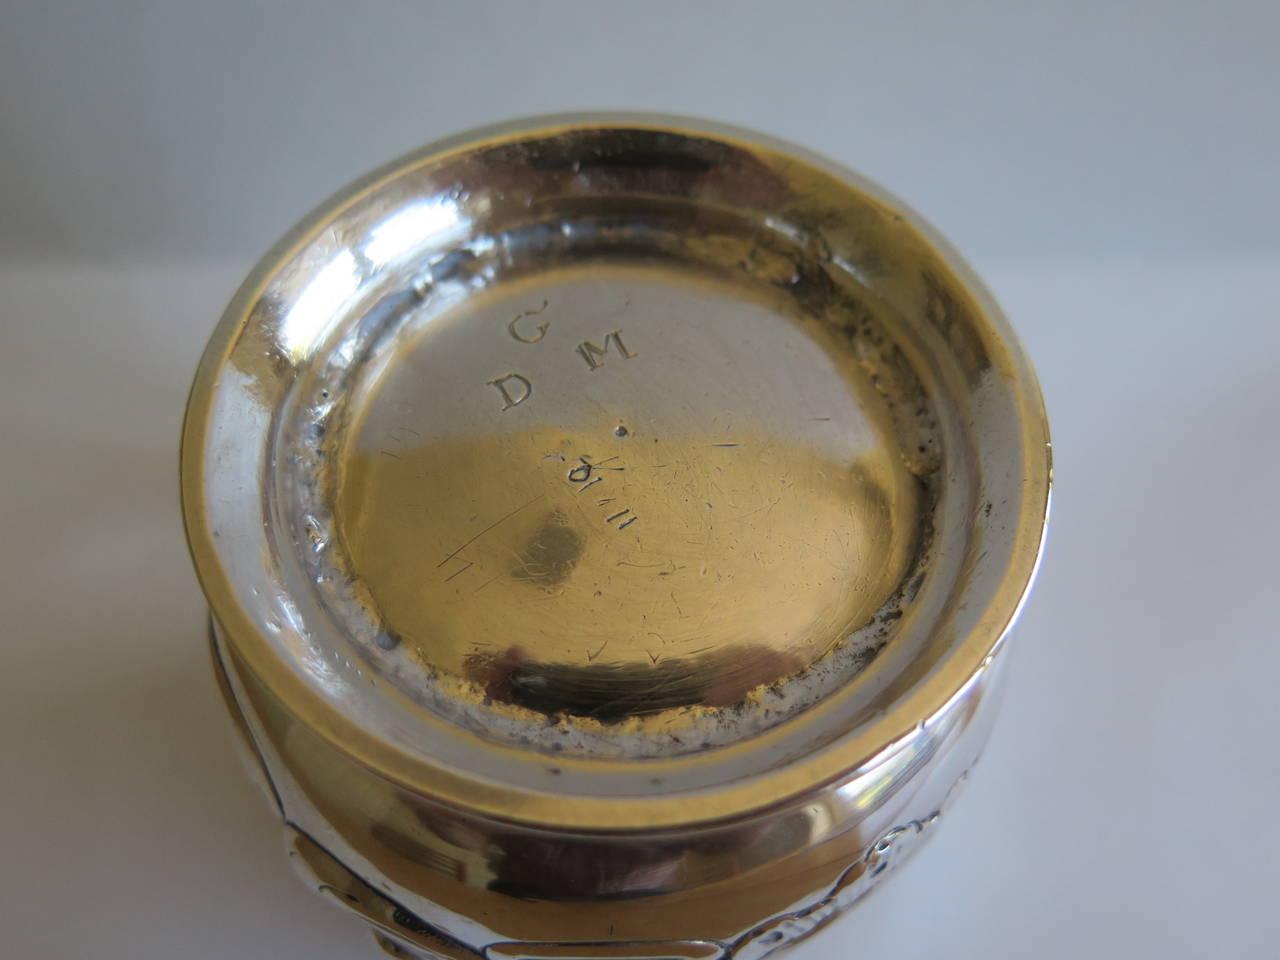 Rare Irish George II Silver Mug or Tankard by John Moore, Dublin 1740 10